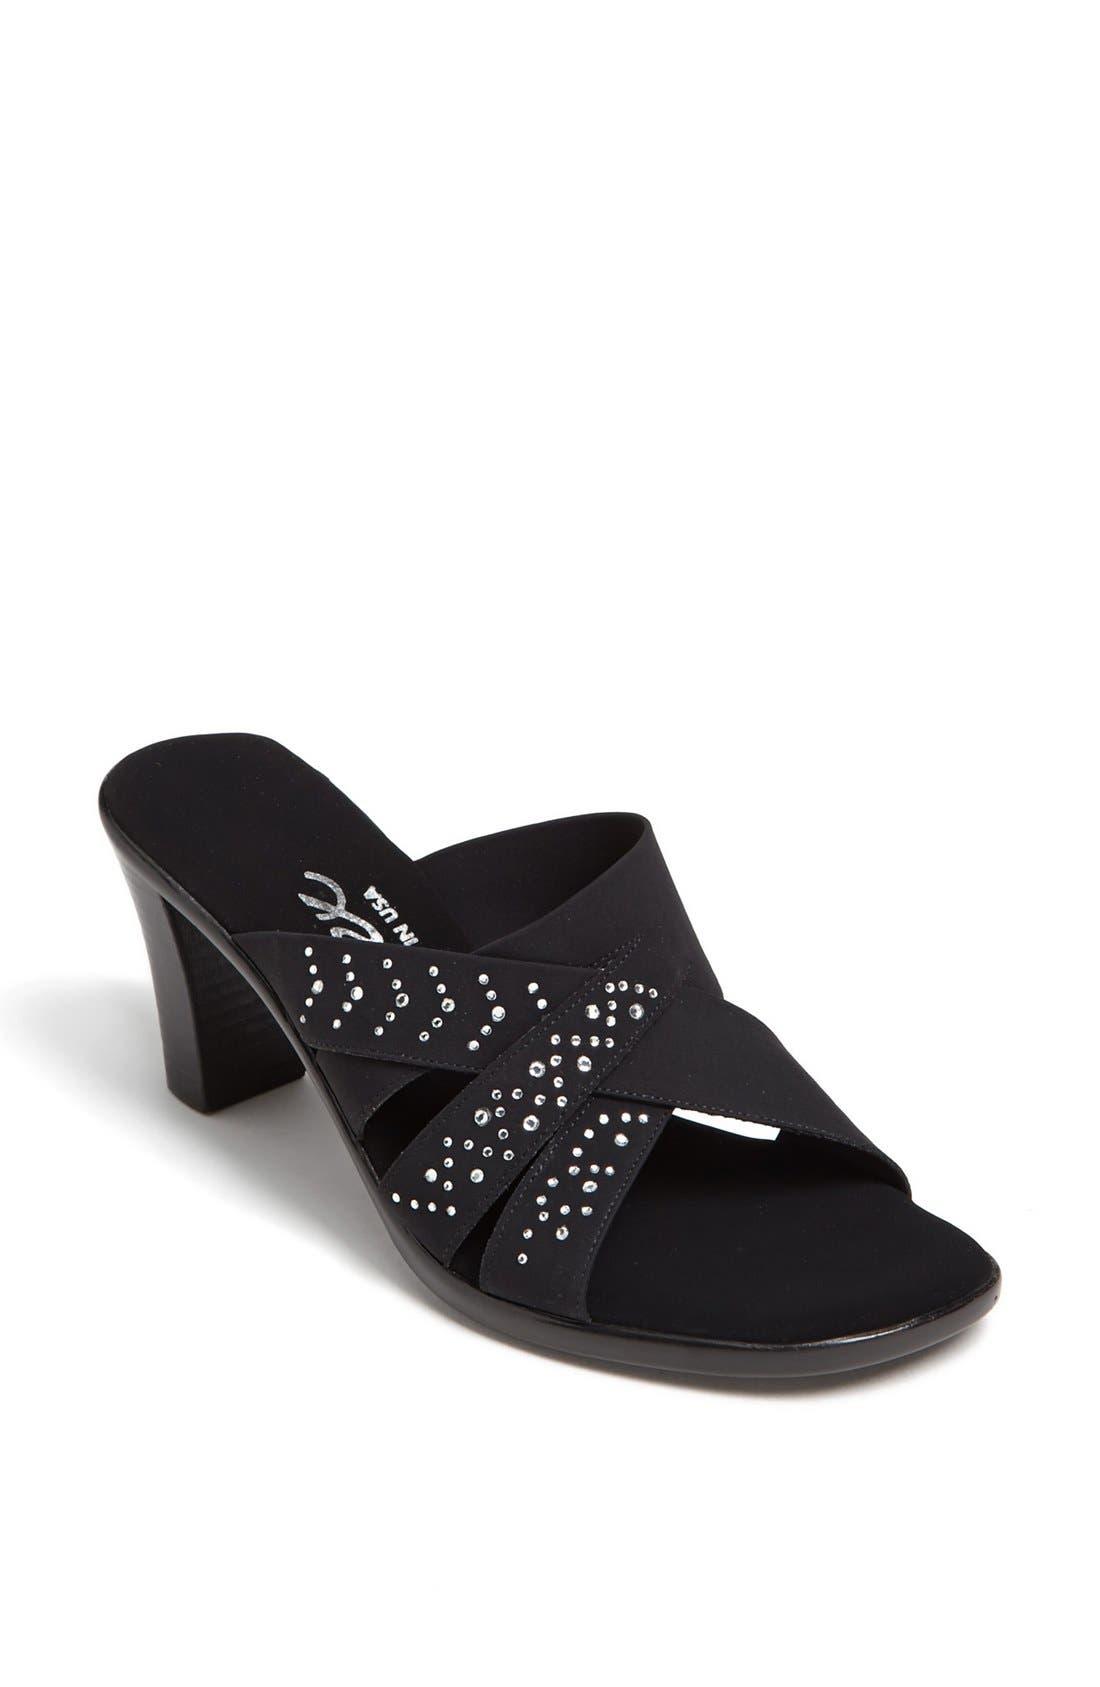 Alternate Image 1 Selected - Onex 'Georgia' Sandal